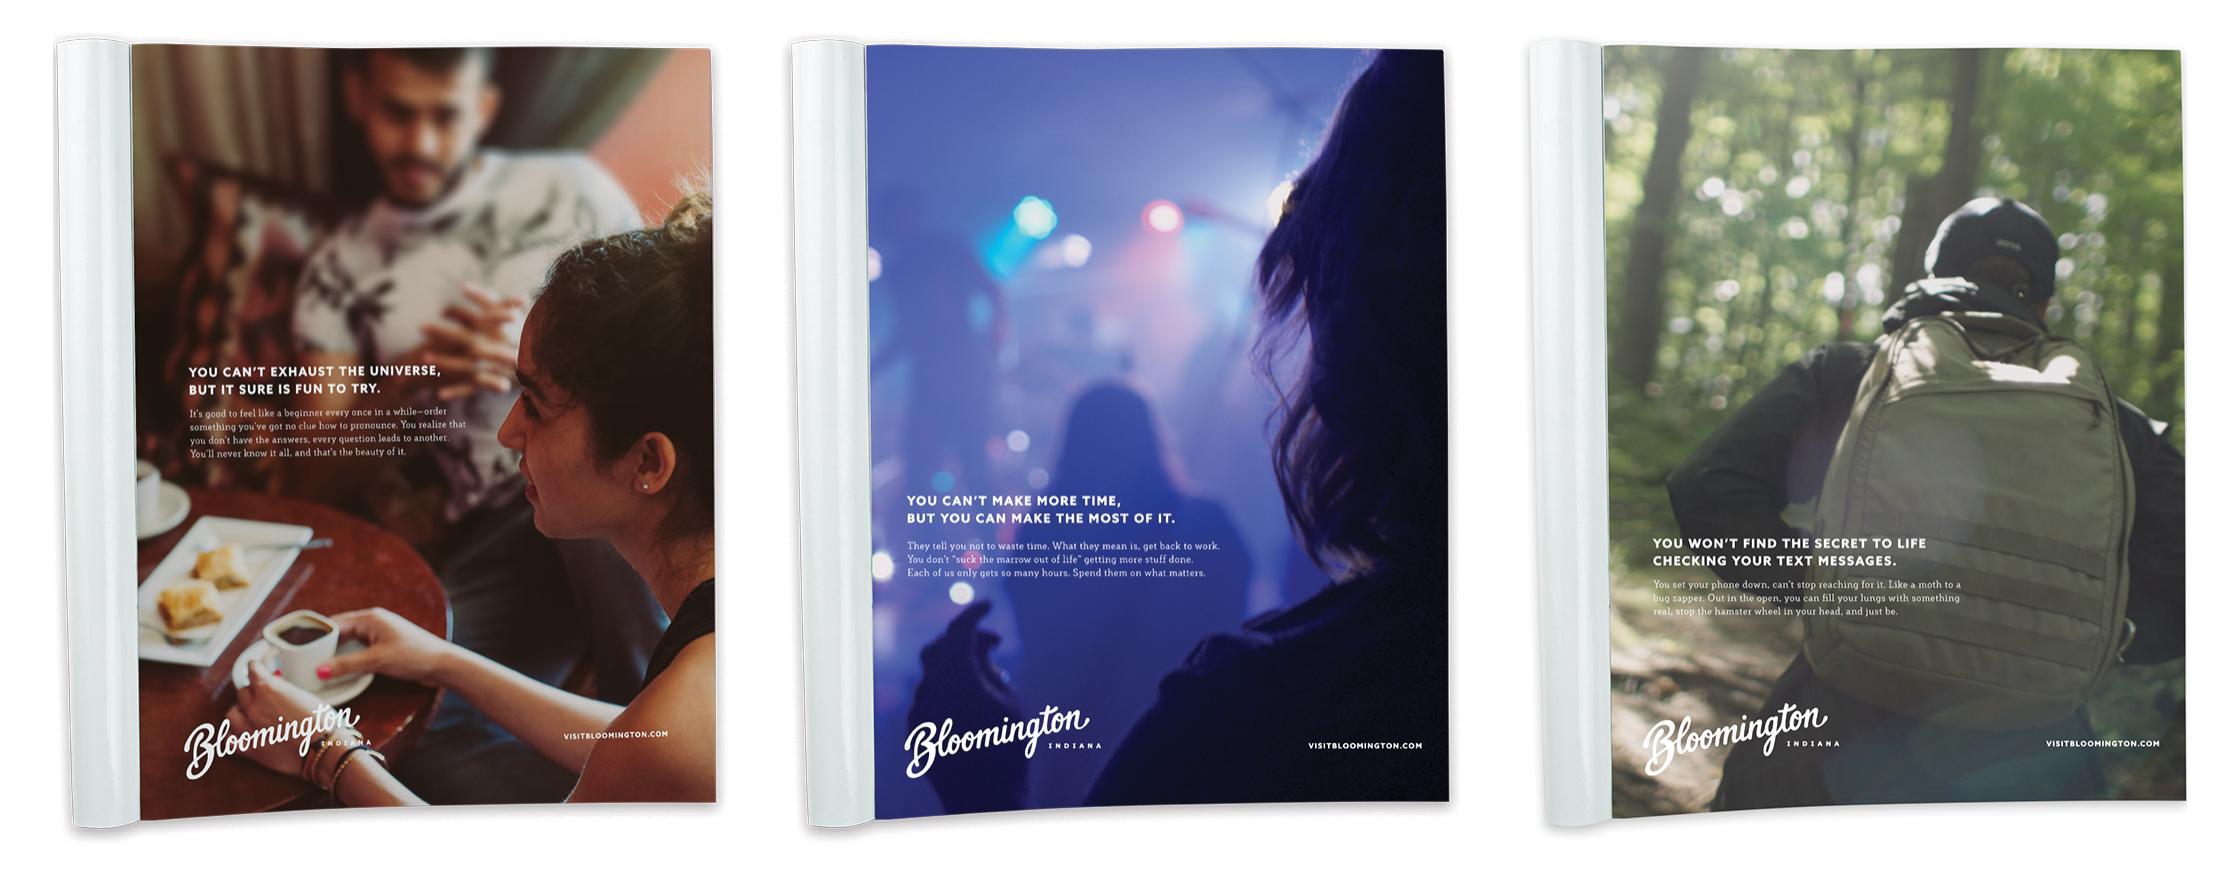 VB_Print-Ads2.png